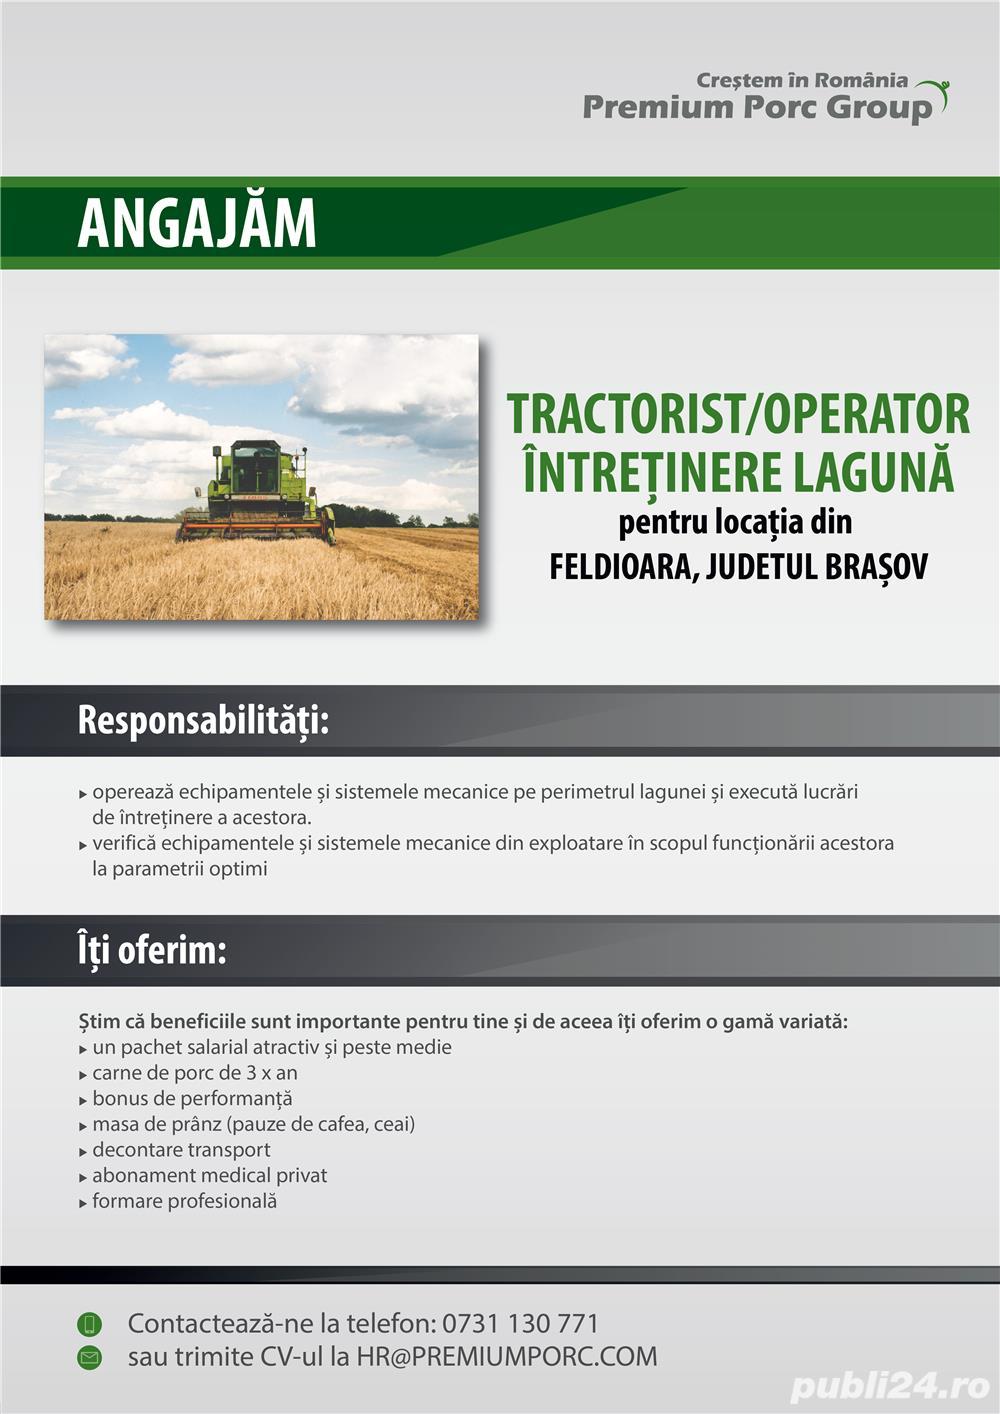 Recrutam tractorist/ingrijitor lagune zona Feldioara, Jud. Brasov